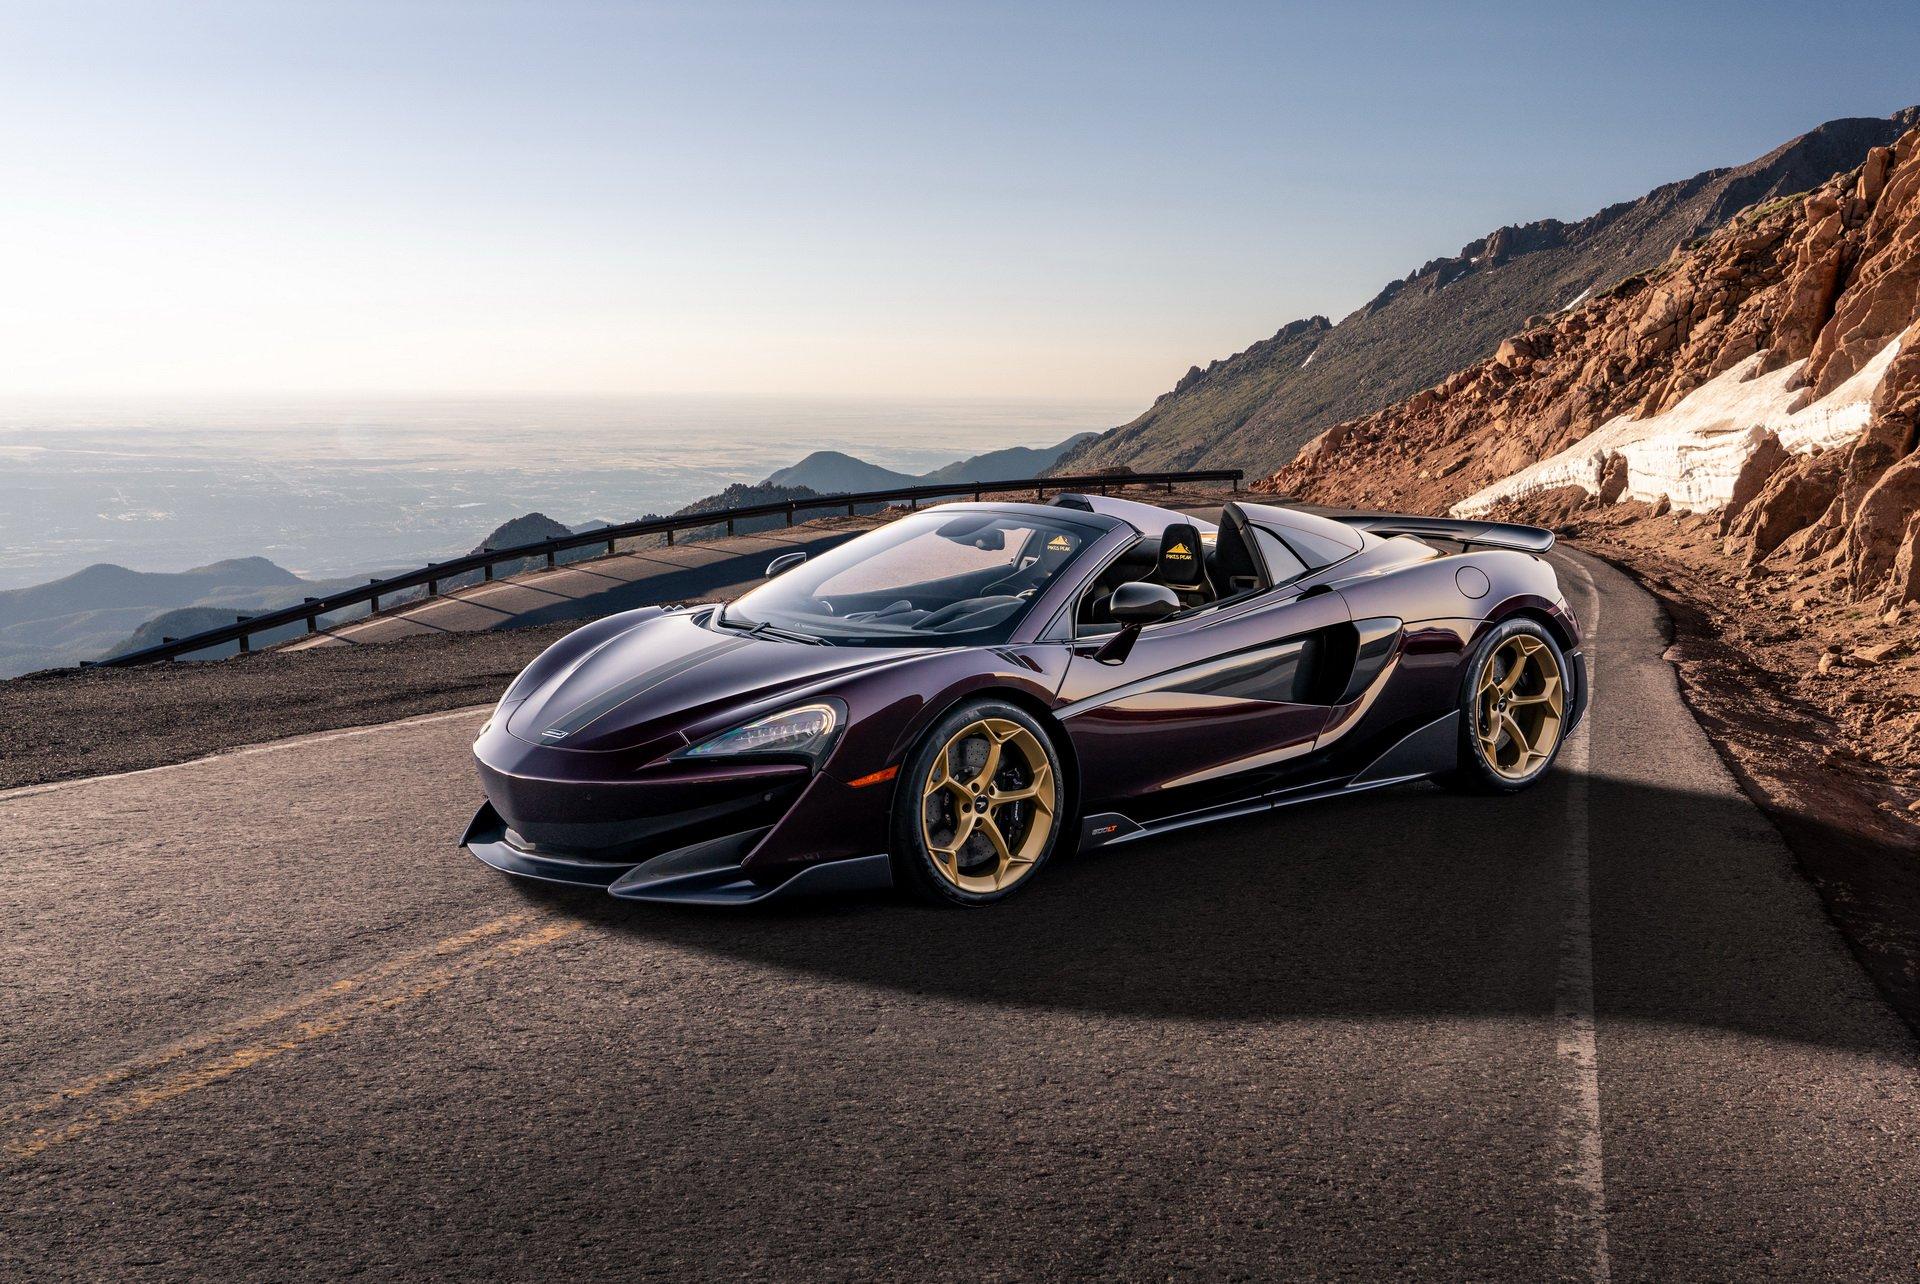 McLaren-600LT-Spider-Pikes-Peak-Collection-by-MSO-5